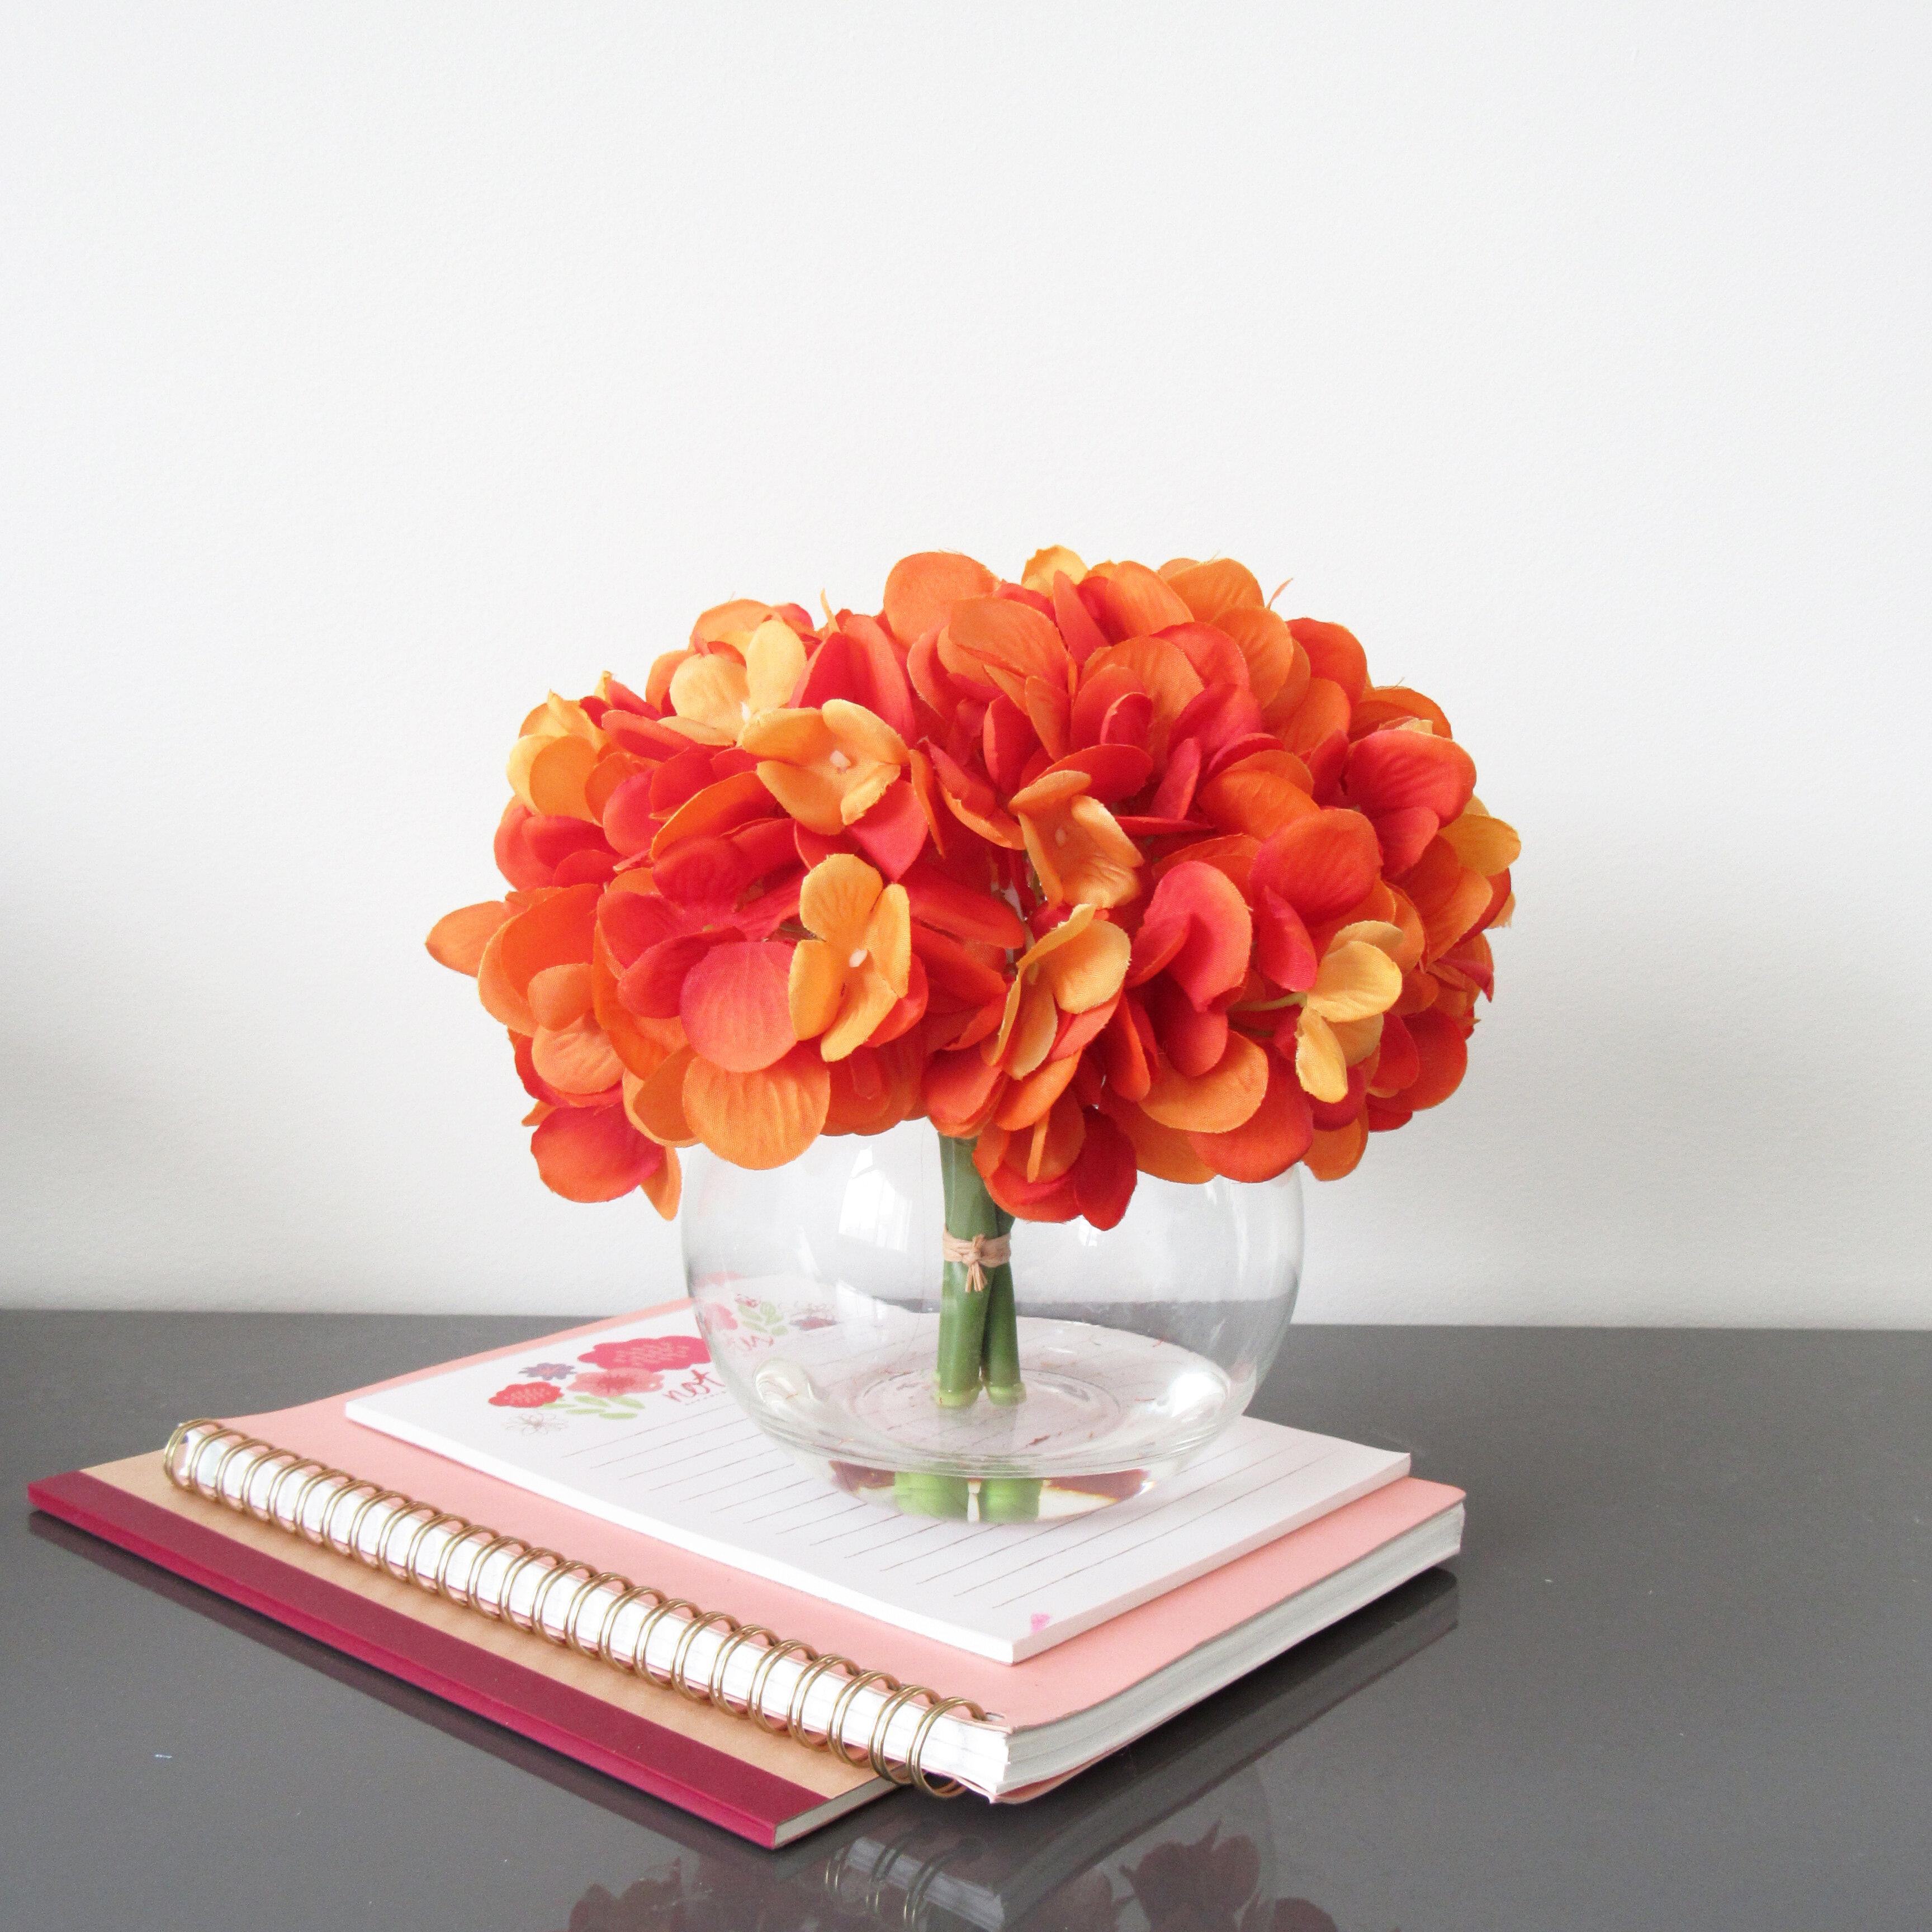 Floral Arrangements Orange Faux Flowers You Ll Love In 2021 Wayfair